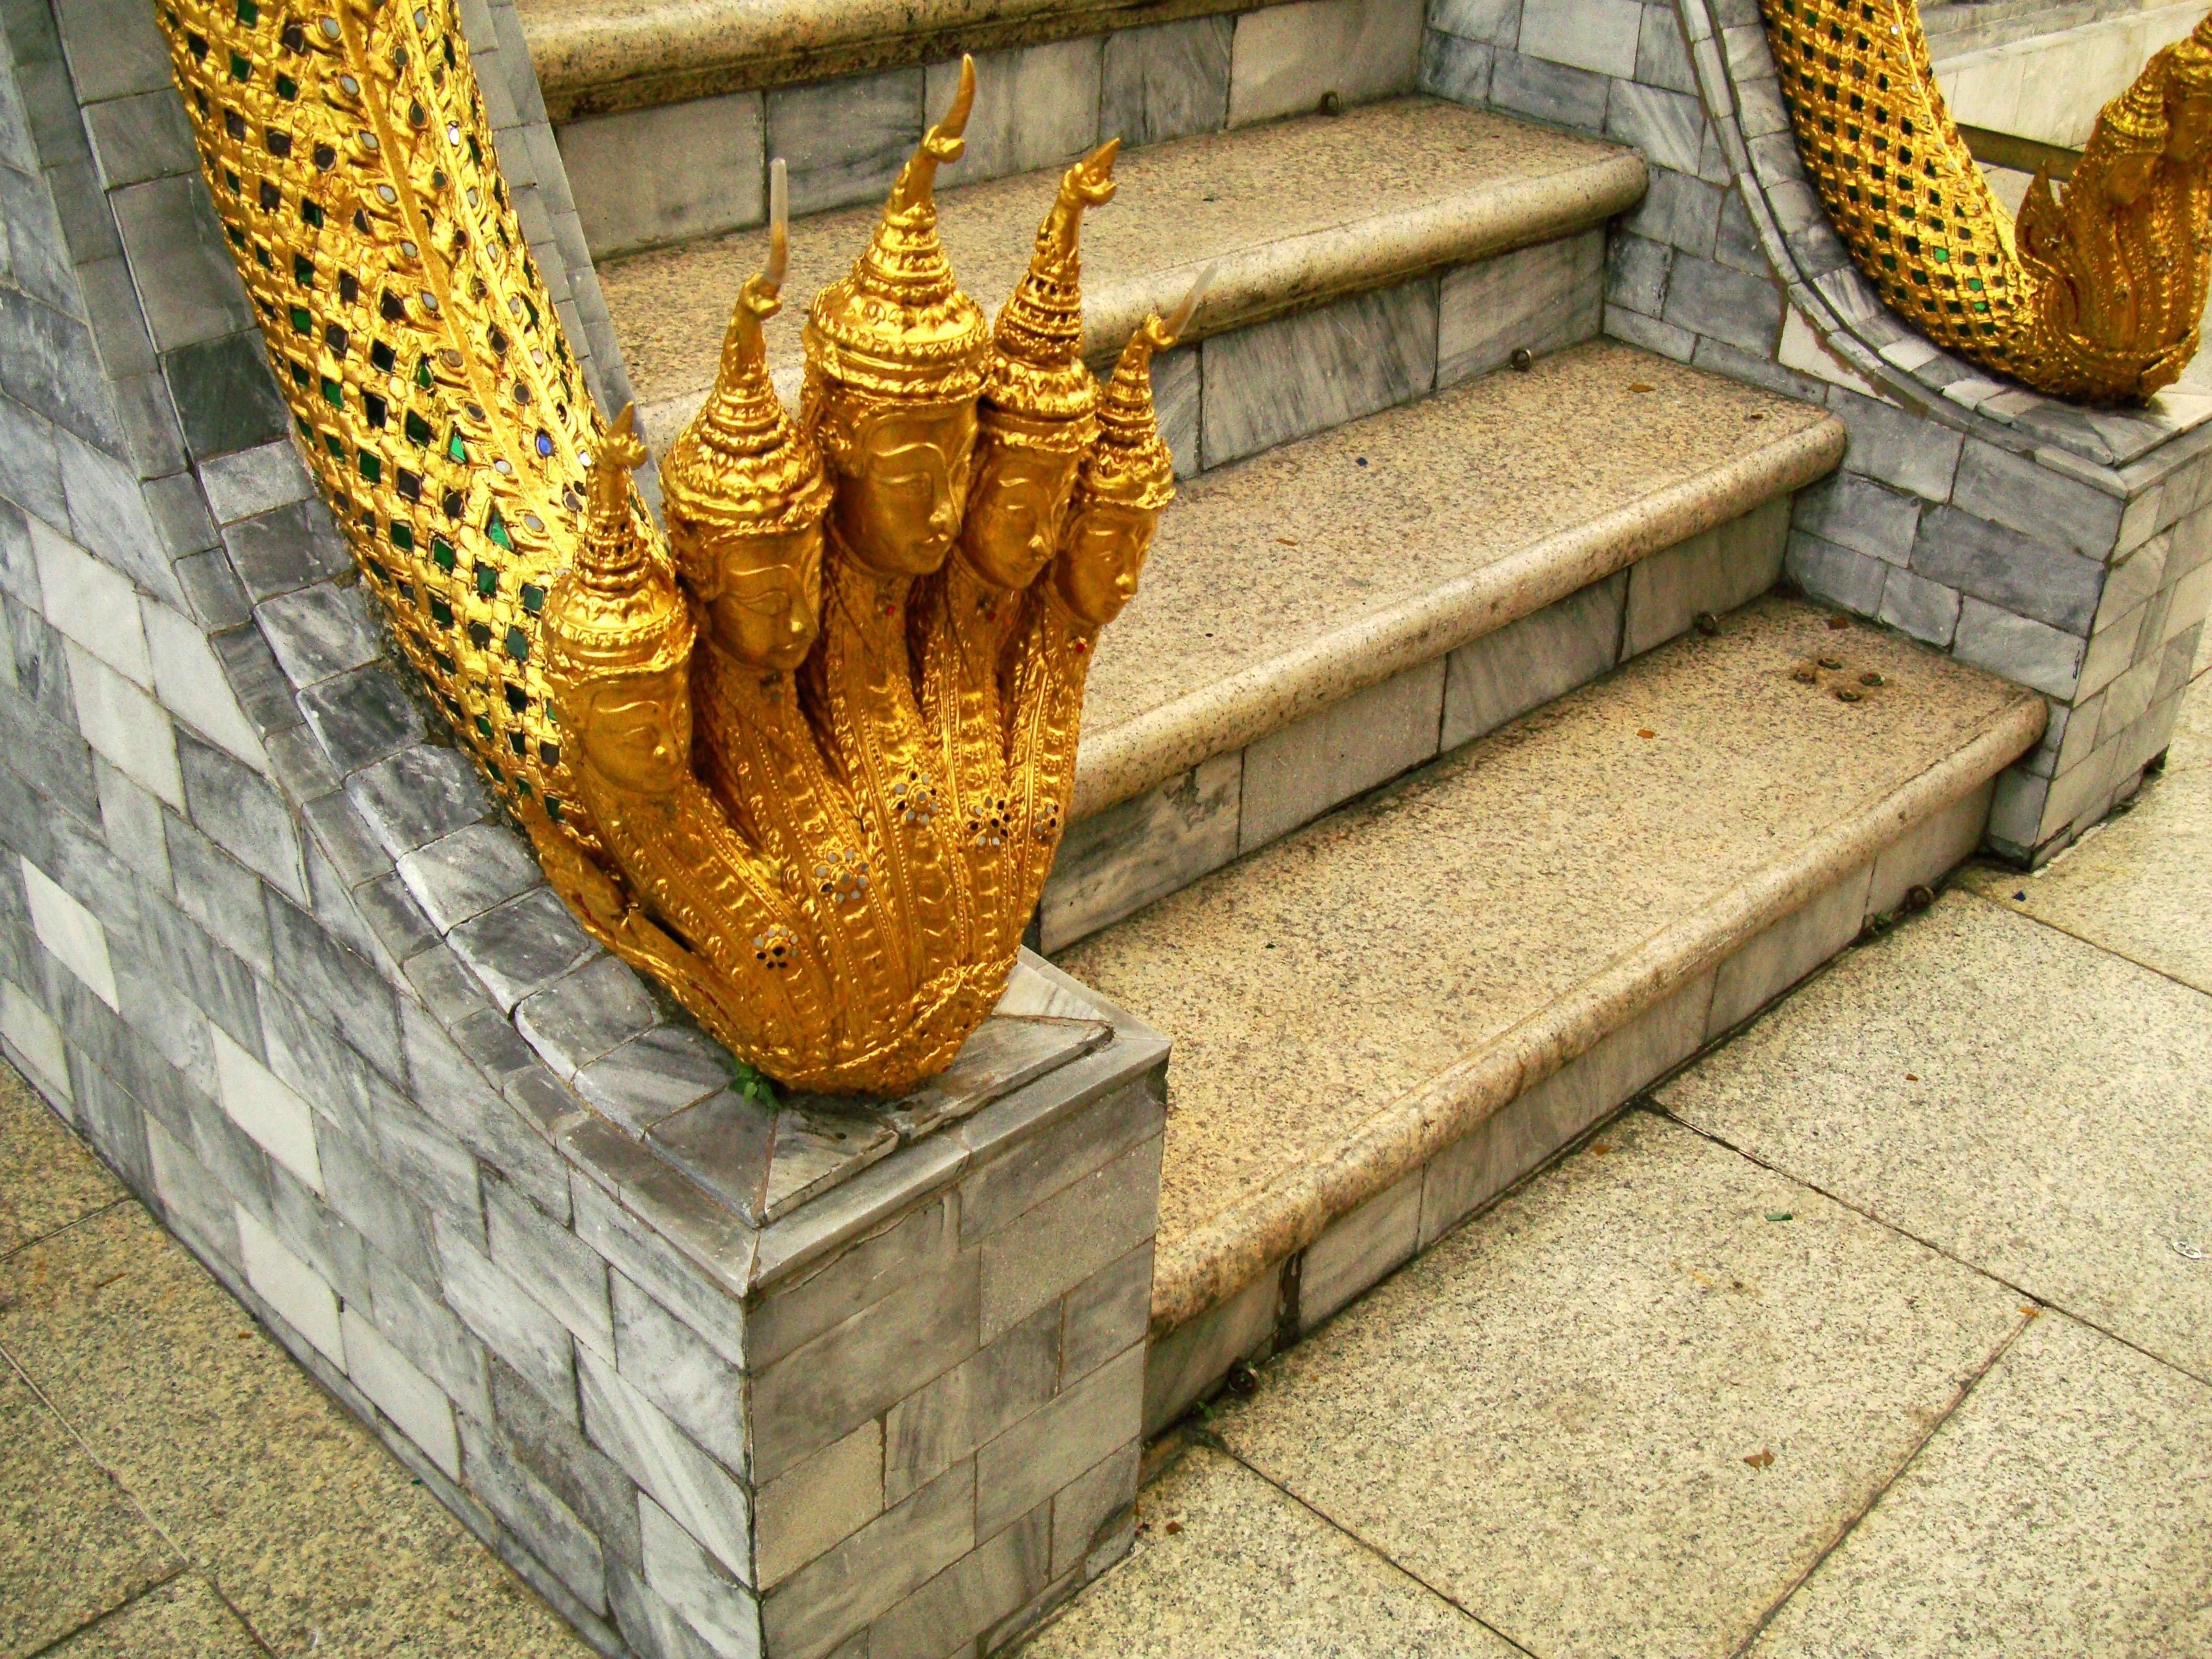 07 Phra Mondop dragon stairs Grand Palace Bangkok 2010 04